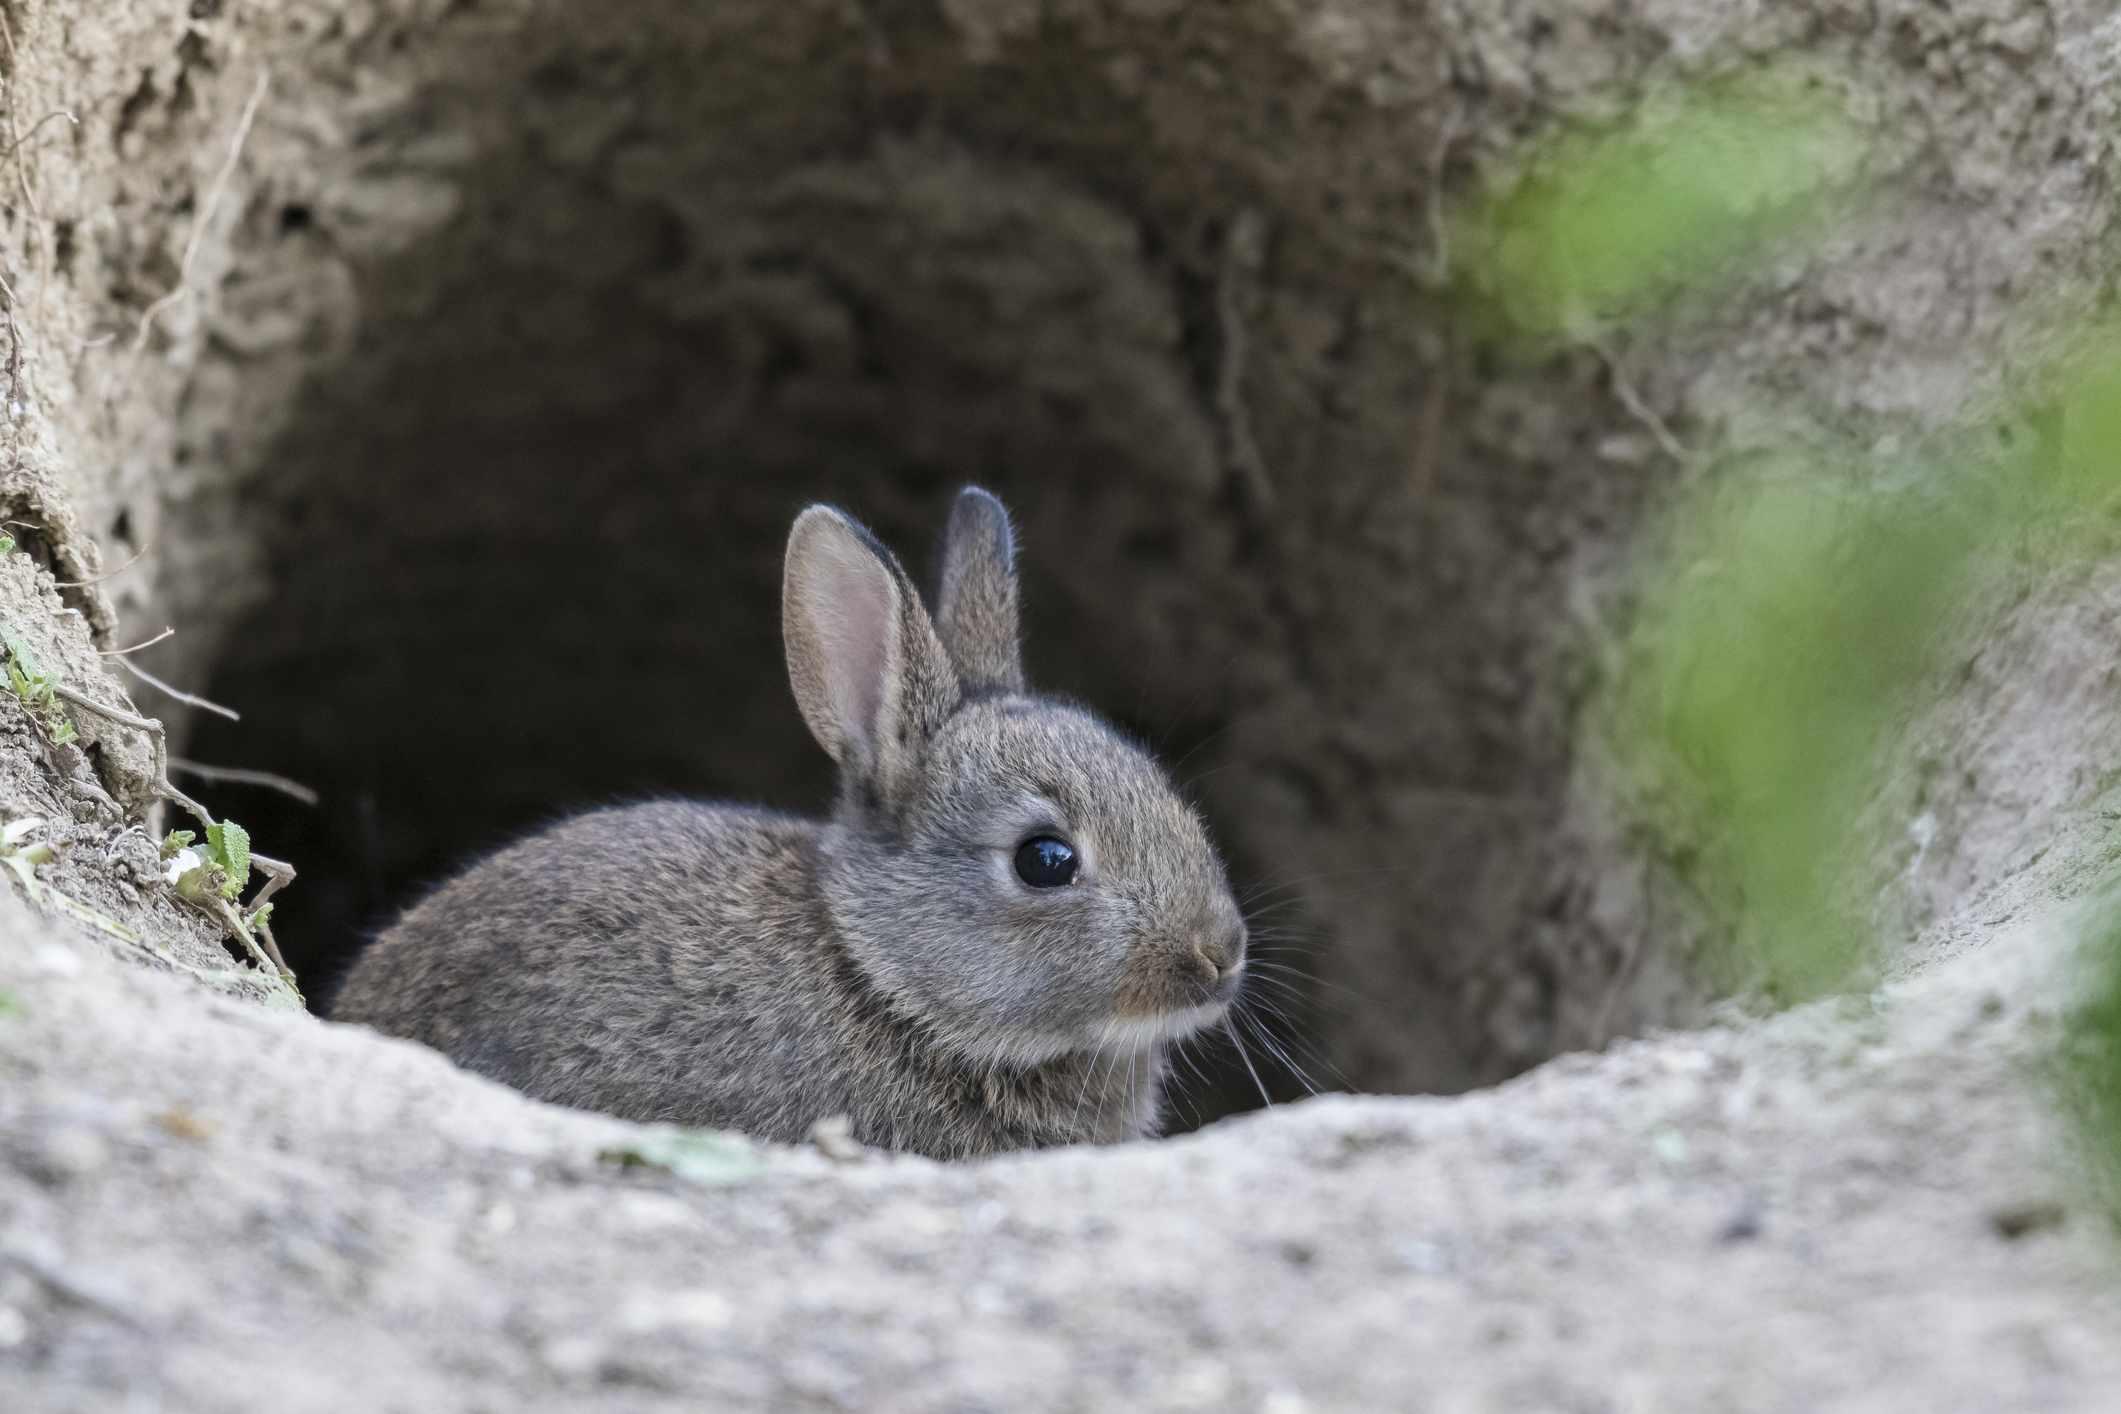 Young European rabbit (Oryctolagus cuniculus) looks curious from Bau, Lower Austria, Austria